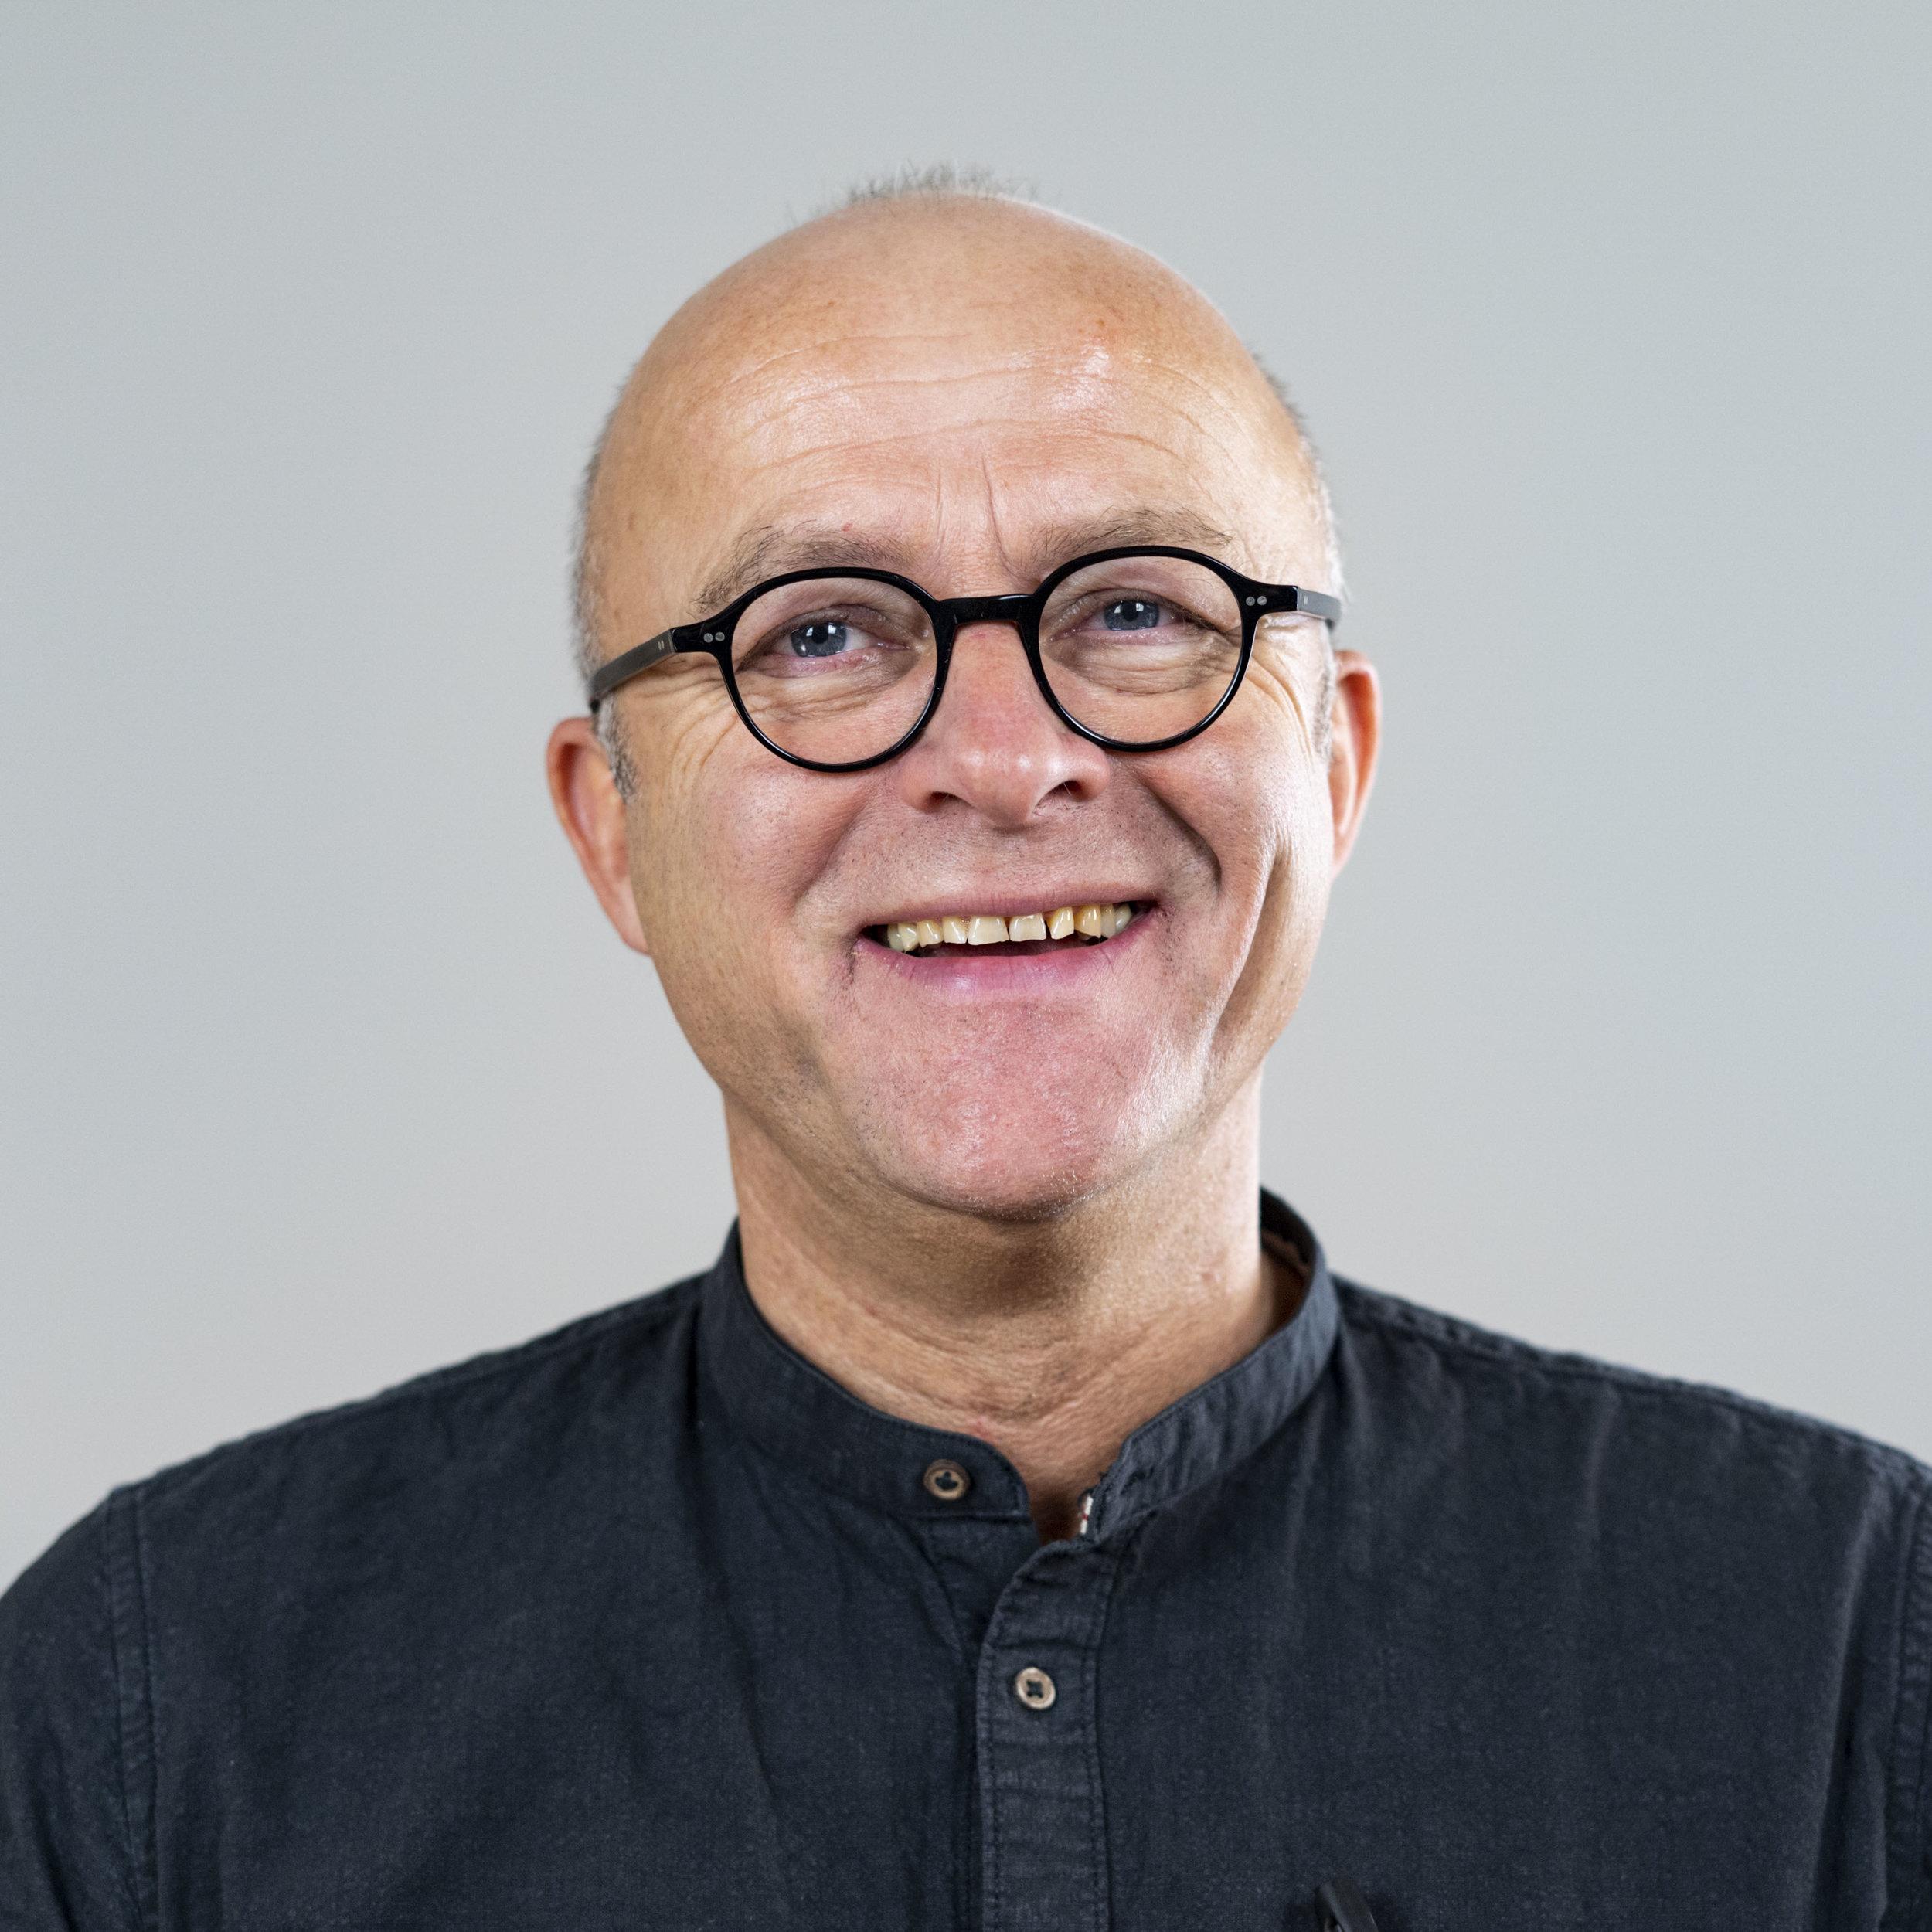 Pastor Edgar Lüken